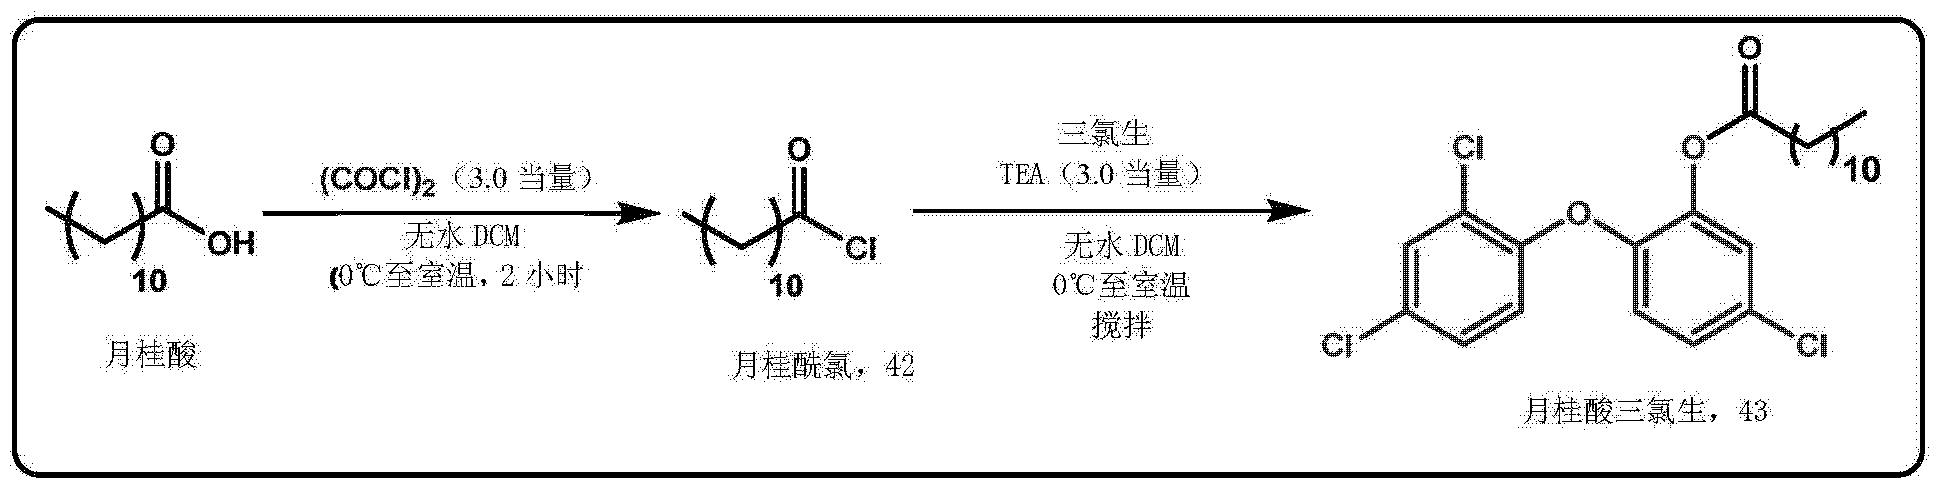 Figure CN103857440AD00821